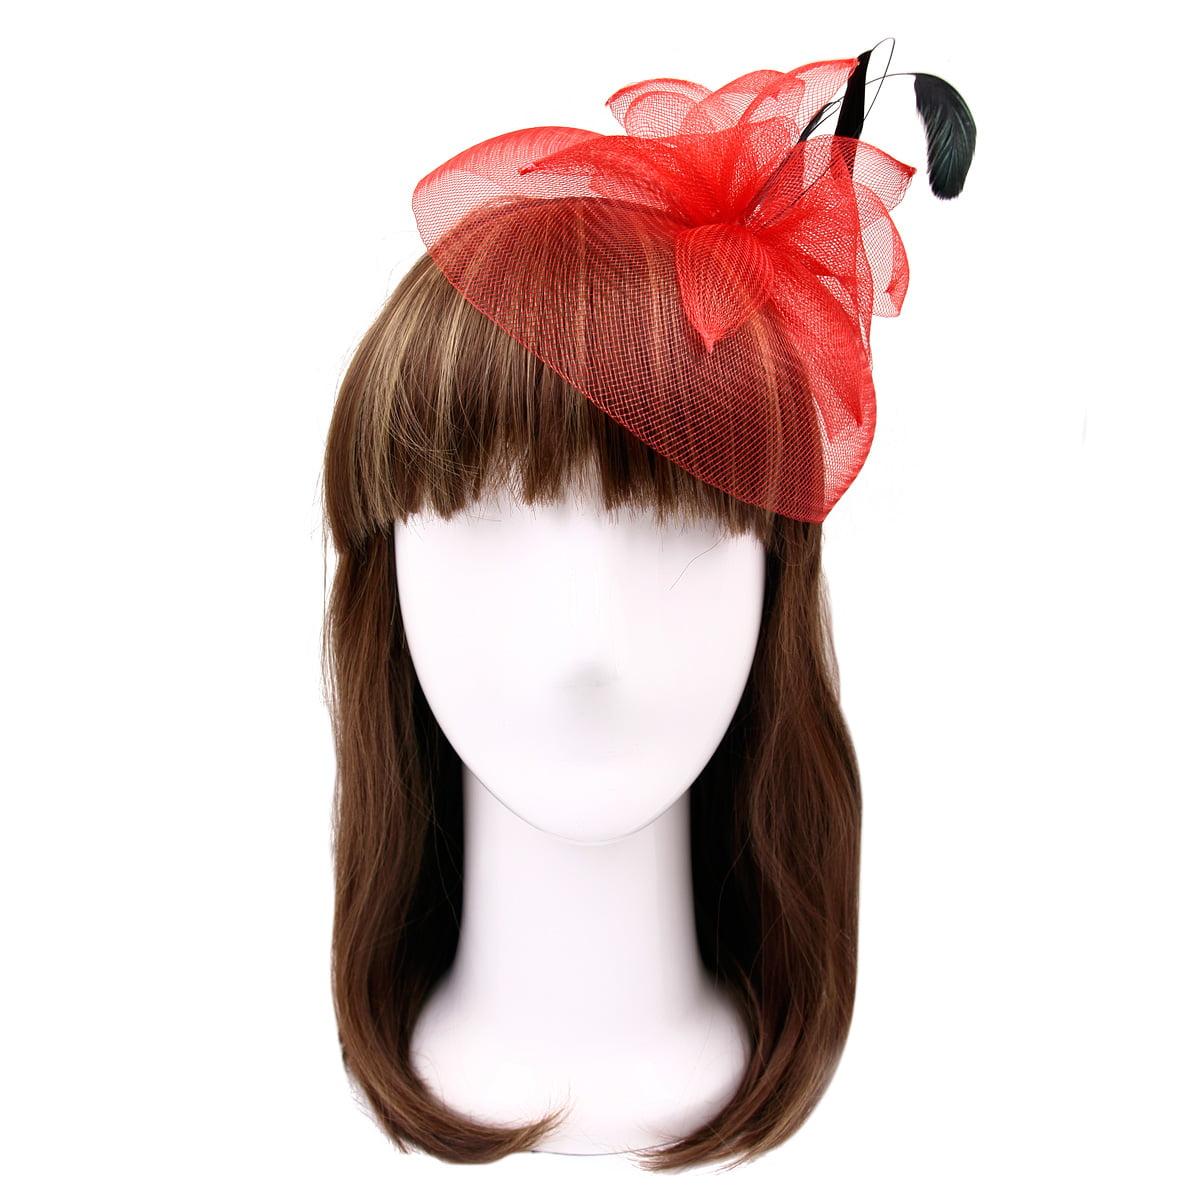 Elegant 2-Way Flower Veil & Feather Fascinator with Clip & Headband